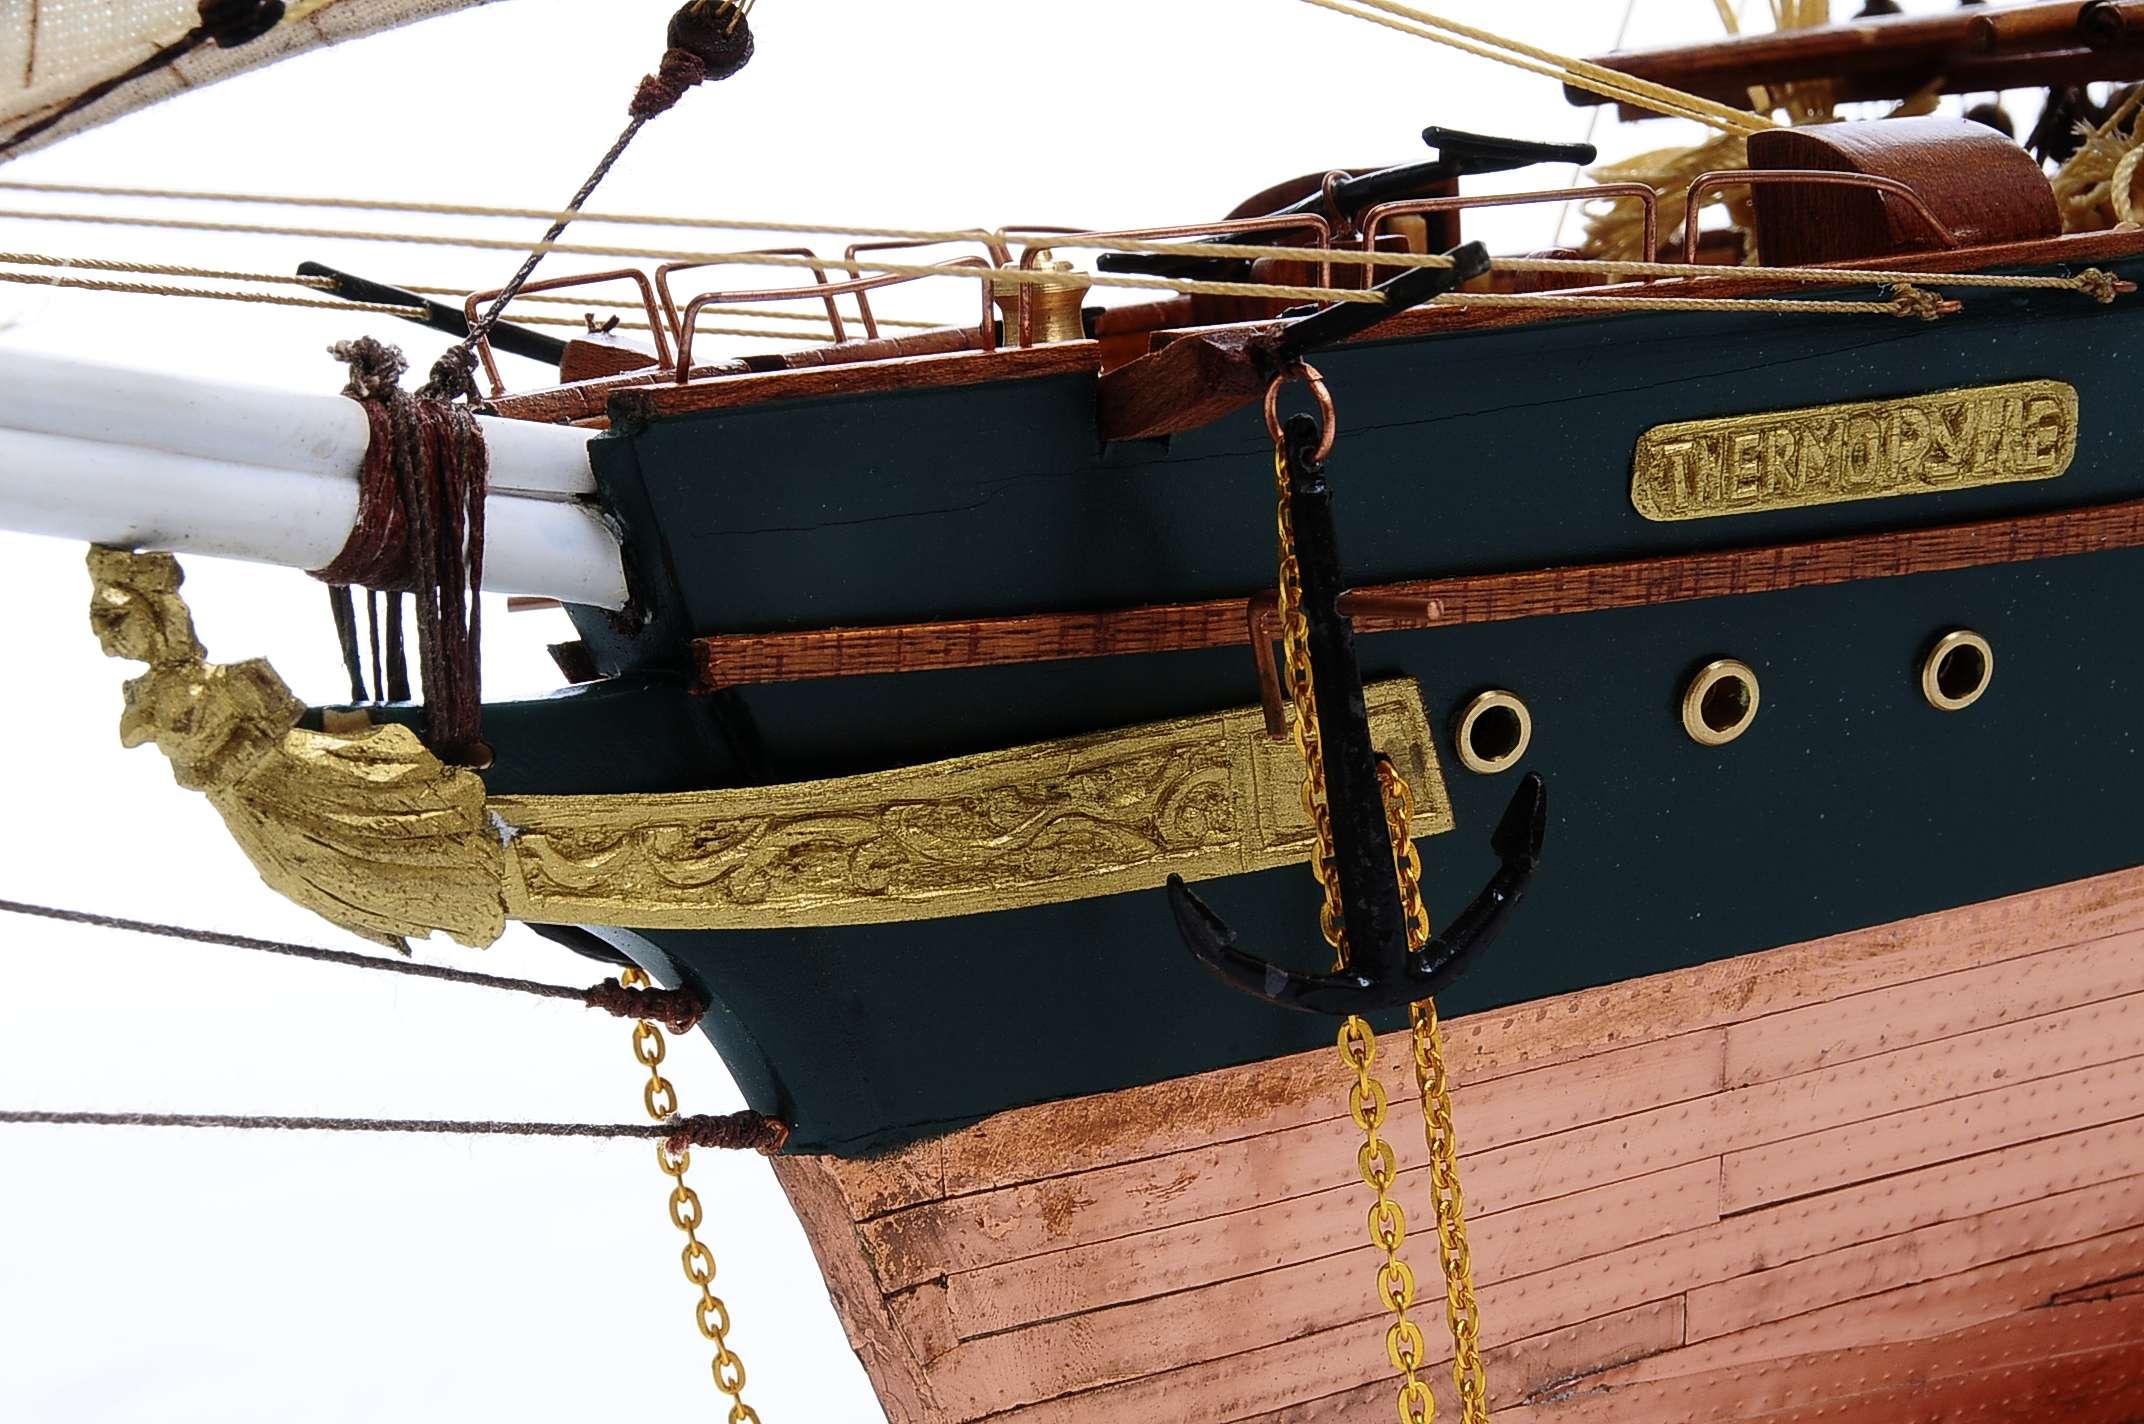 1434-4874-Thermopylae-Model-Boat